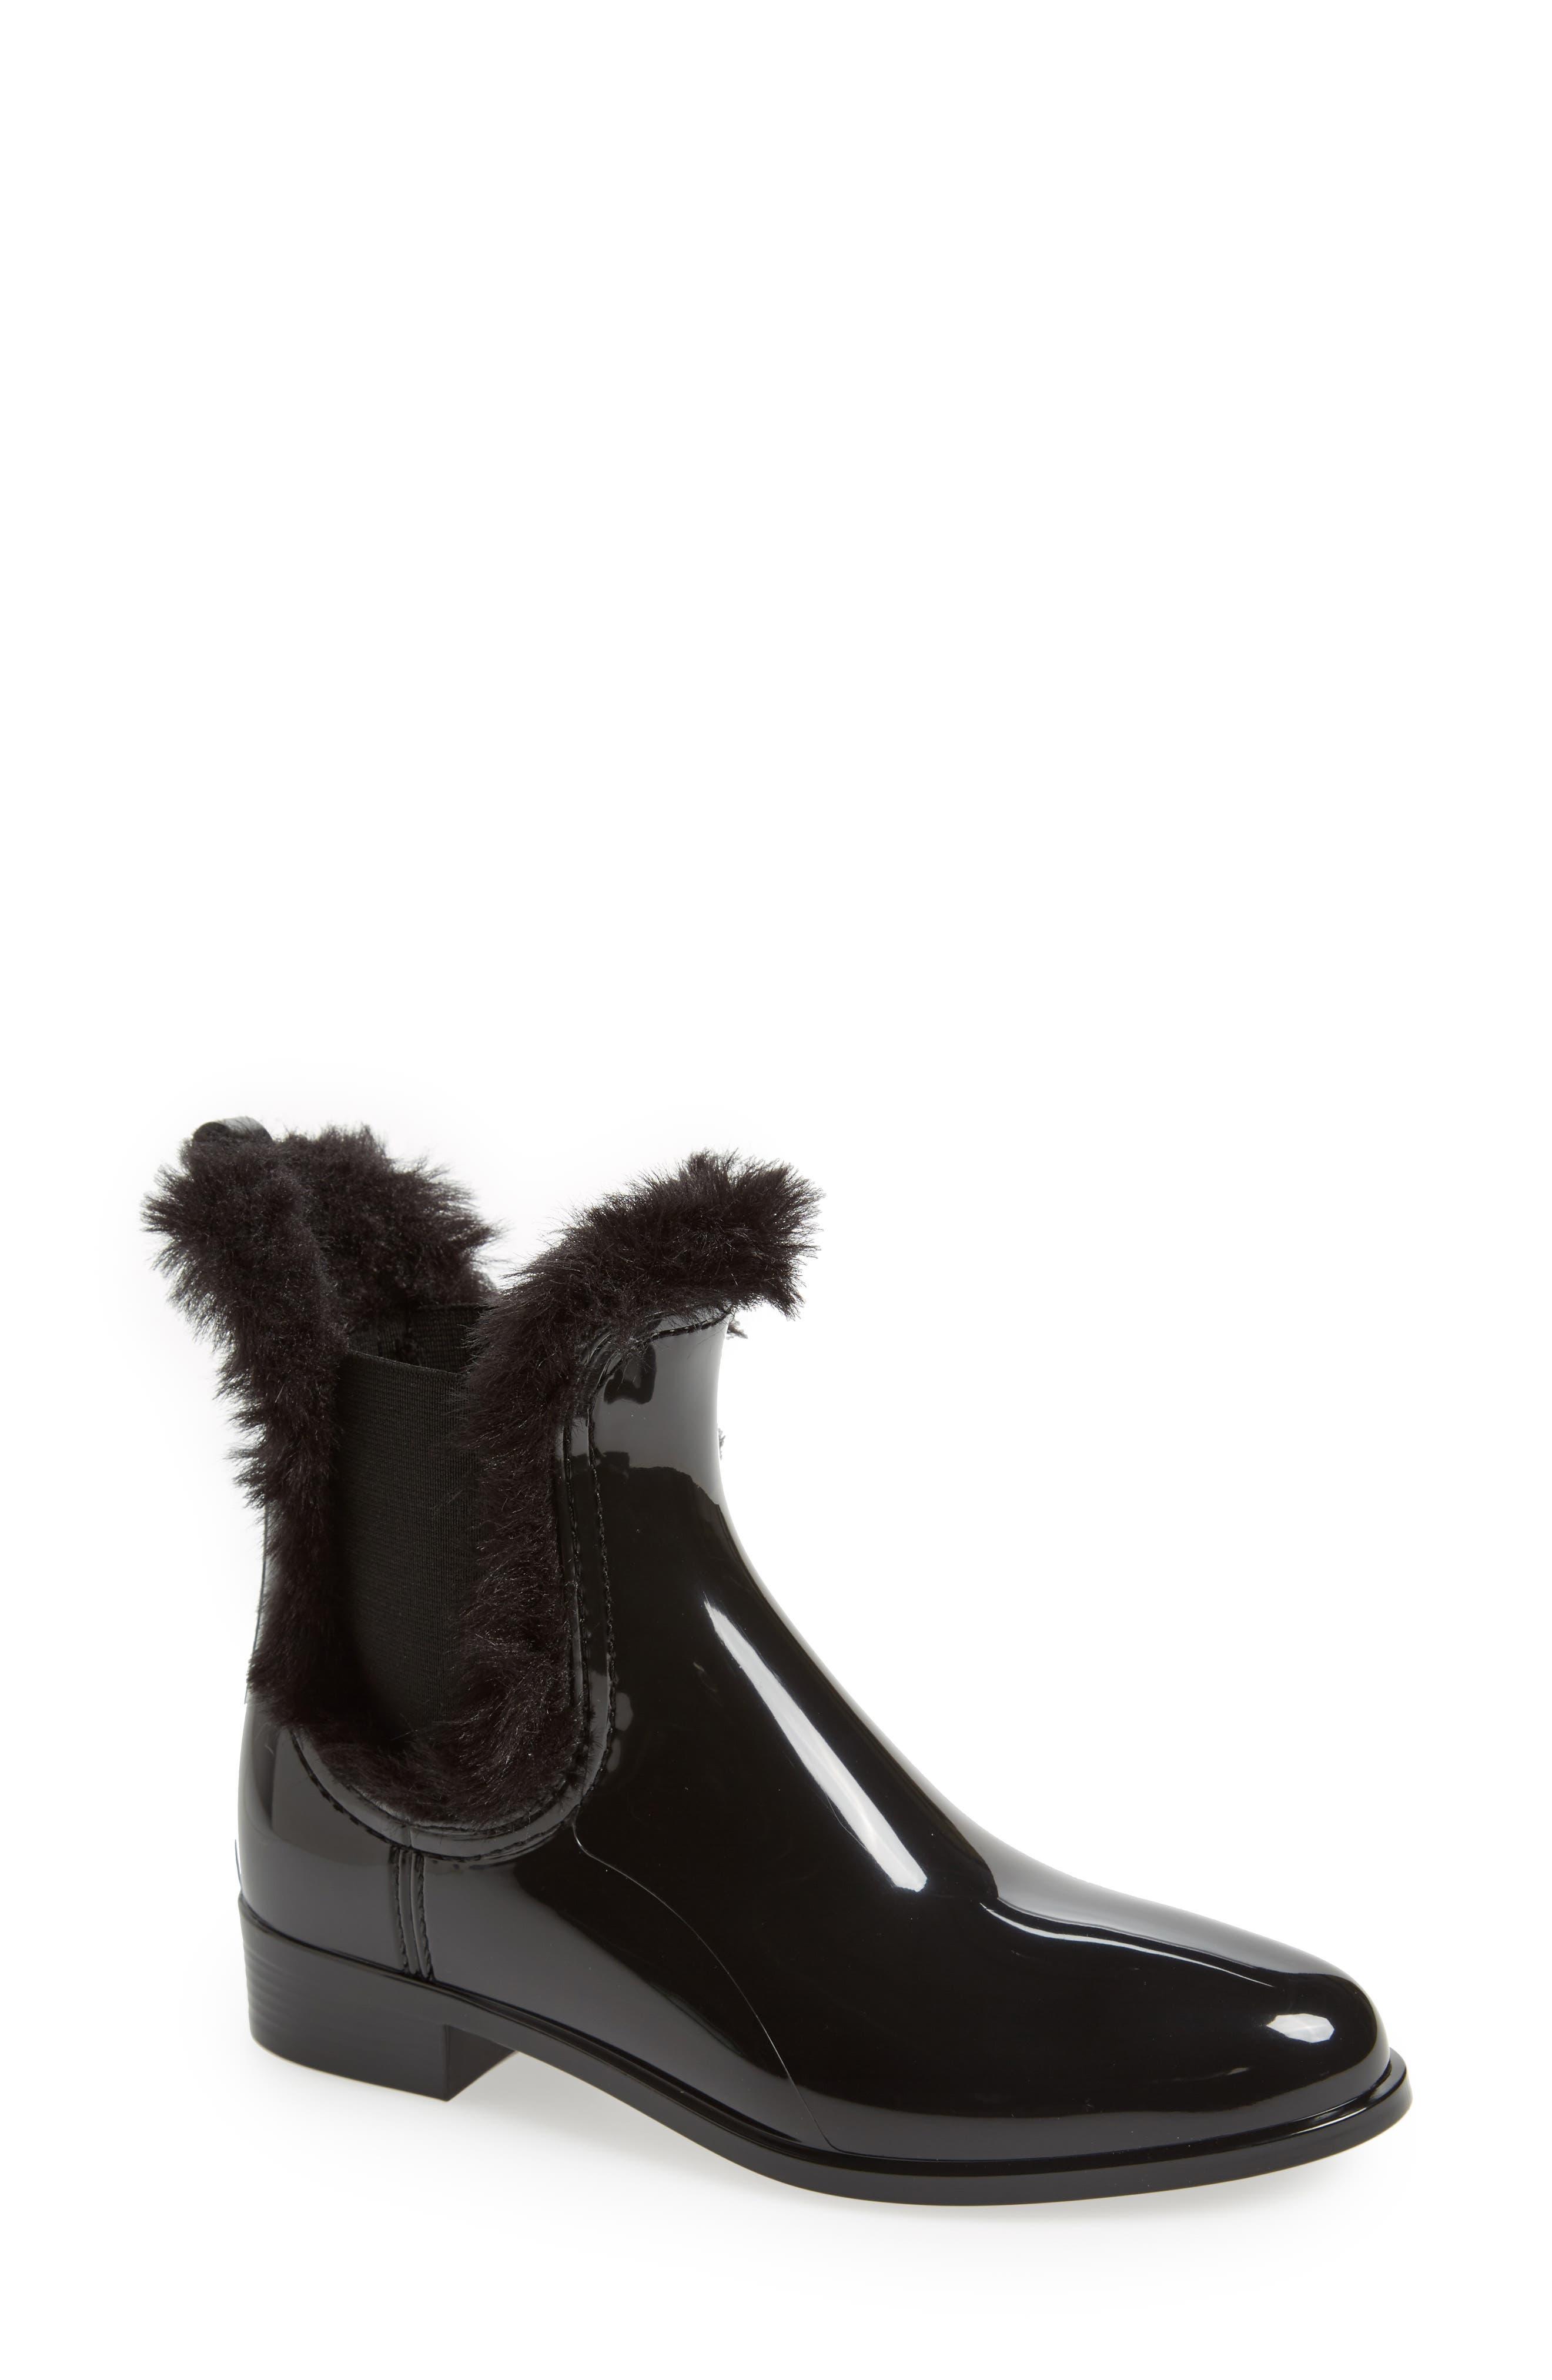 Aisha Waterproof Chelsea Boot with Faux Fur Lining,                             Main thumbnail 1, color,                             BLACK GLOSS